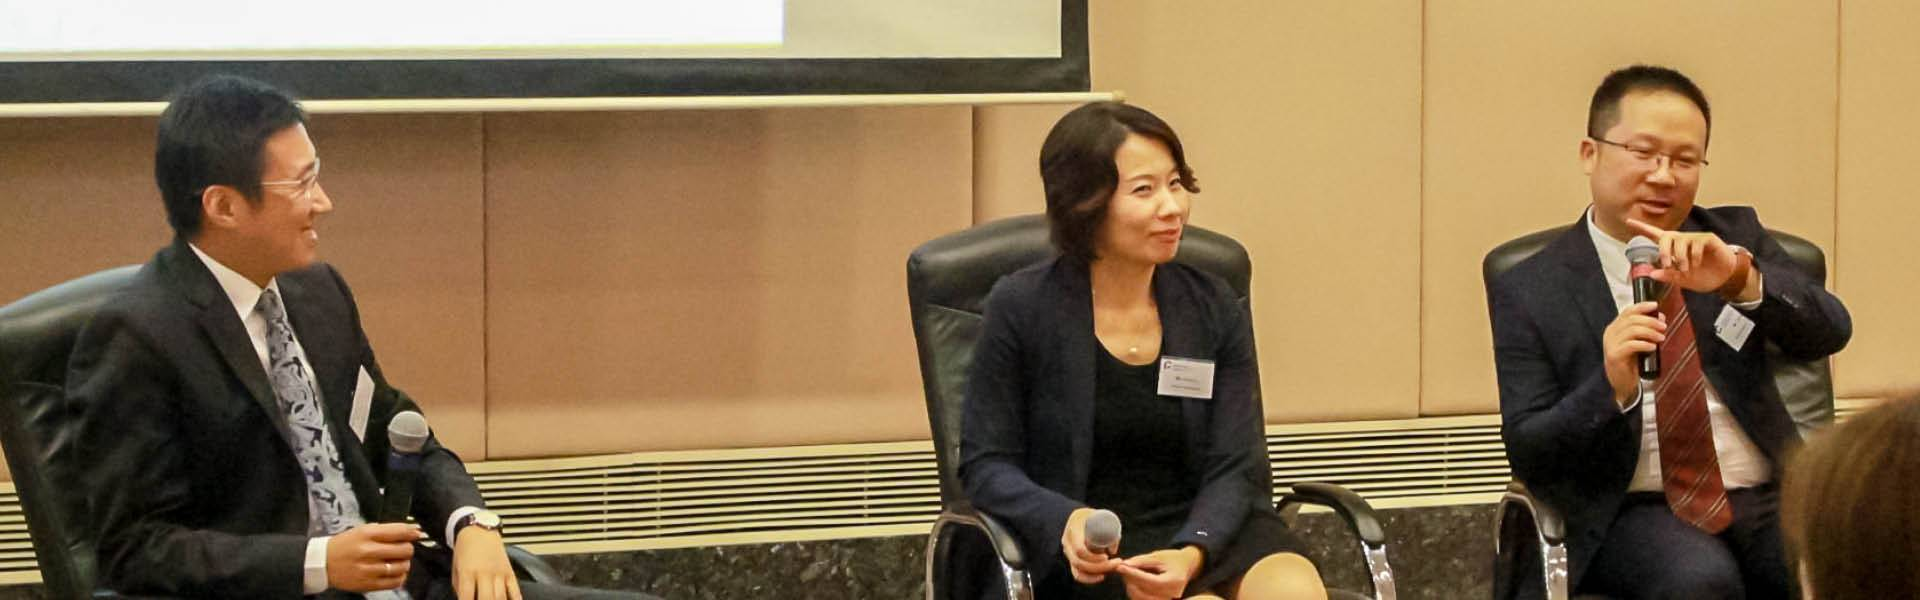 gc_shanghai_communication-forum_1920x600